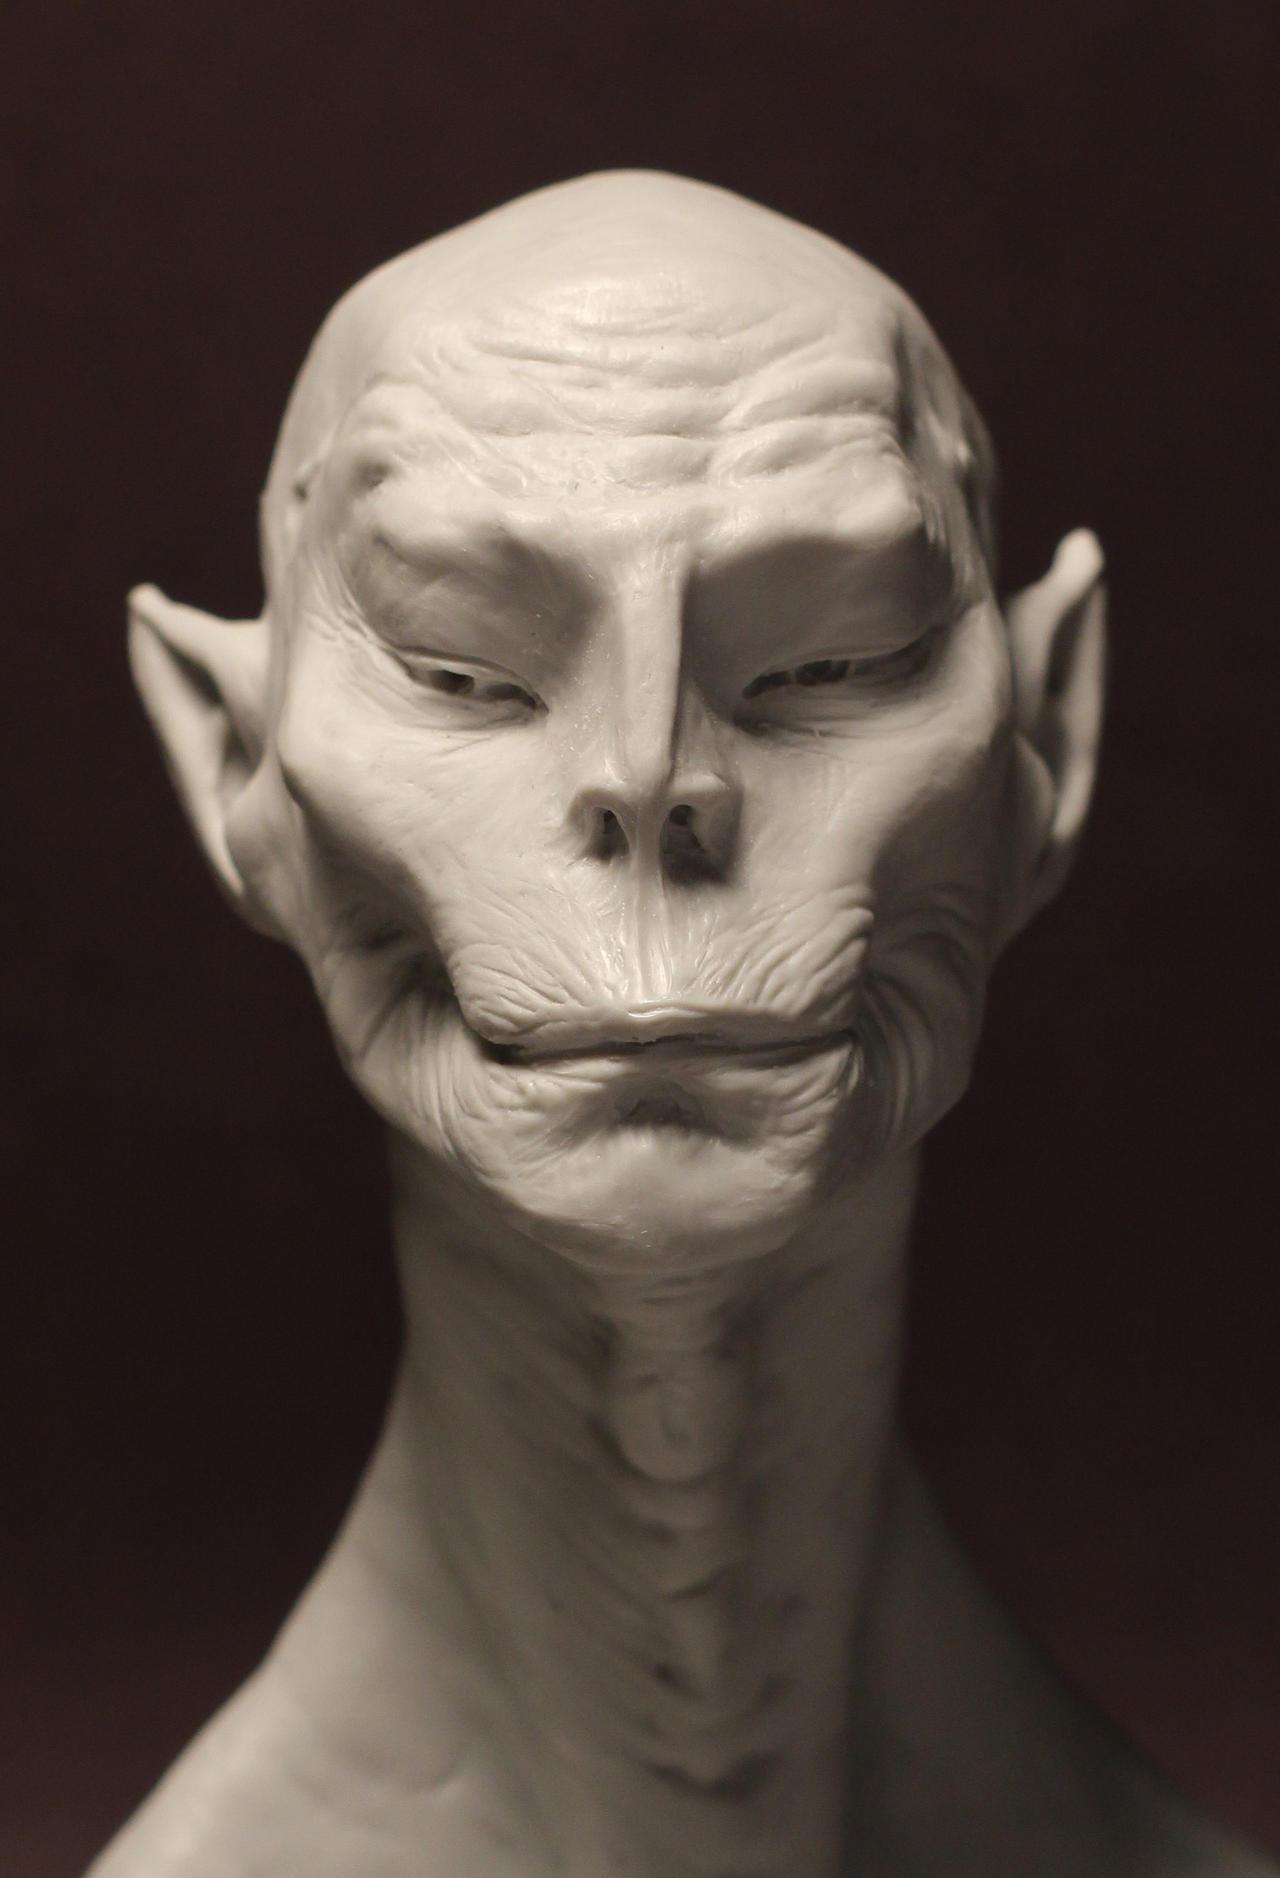 Scheming Demon - 2 by Jengabean